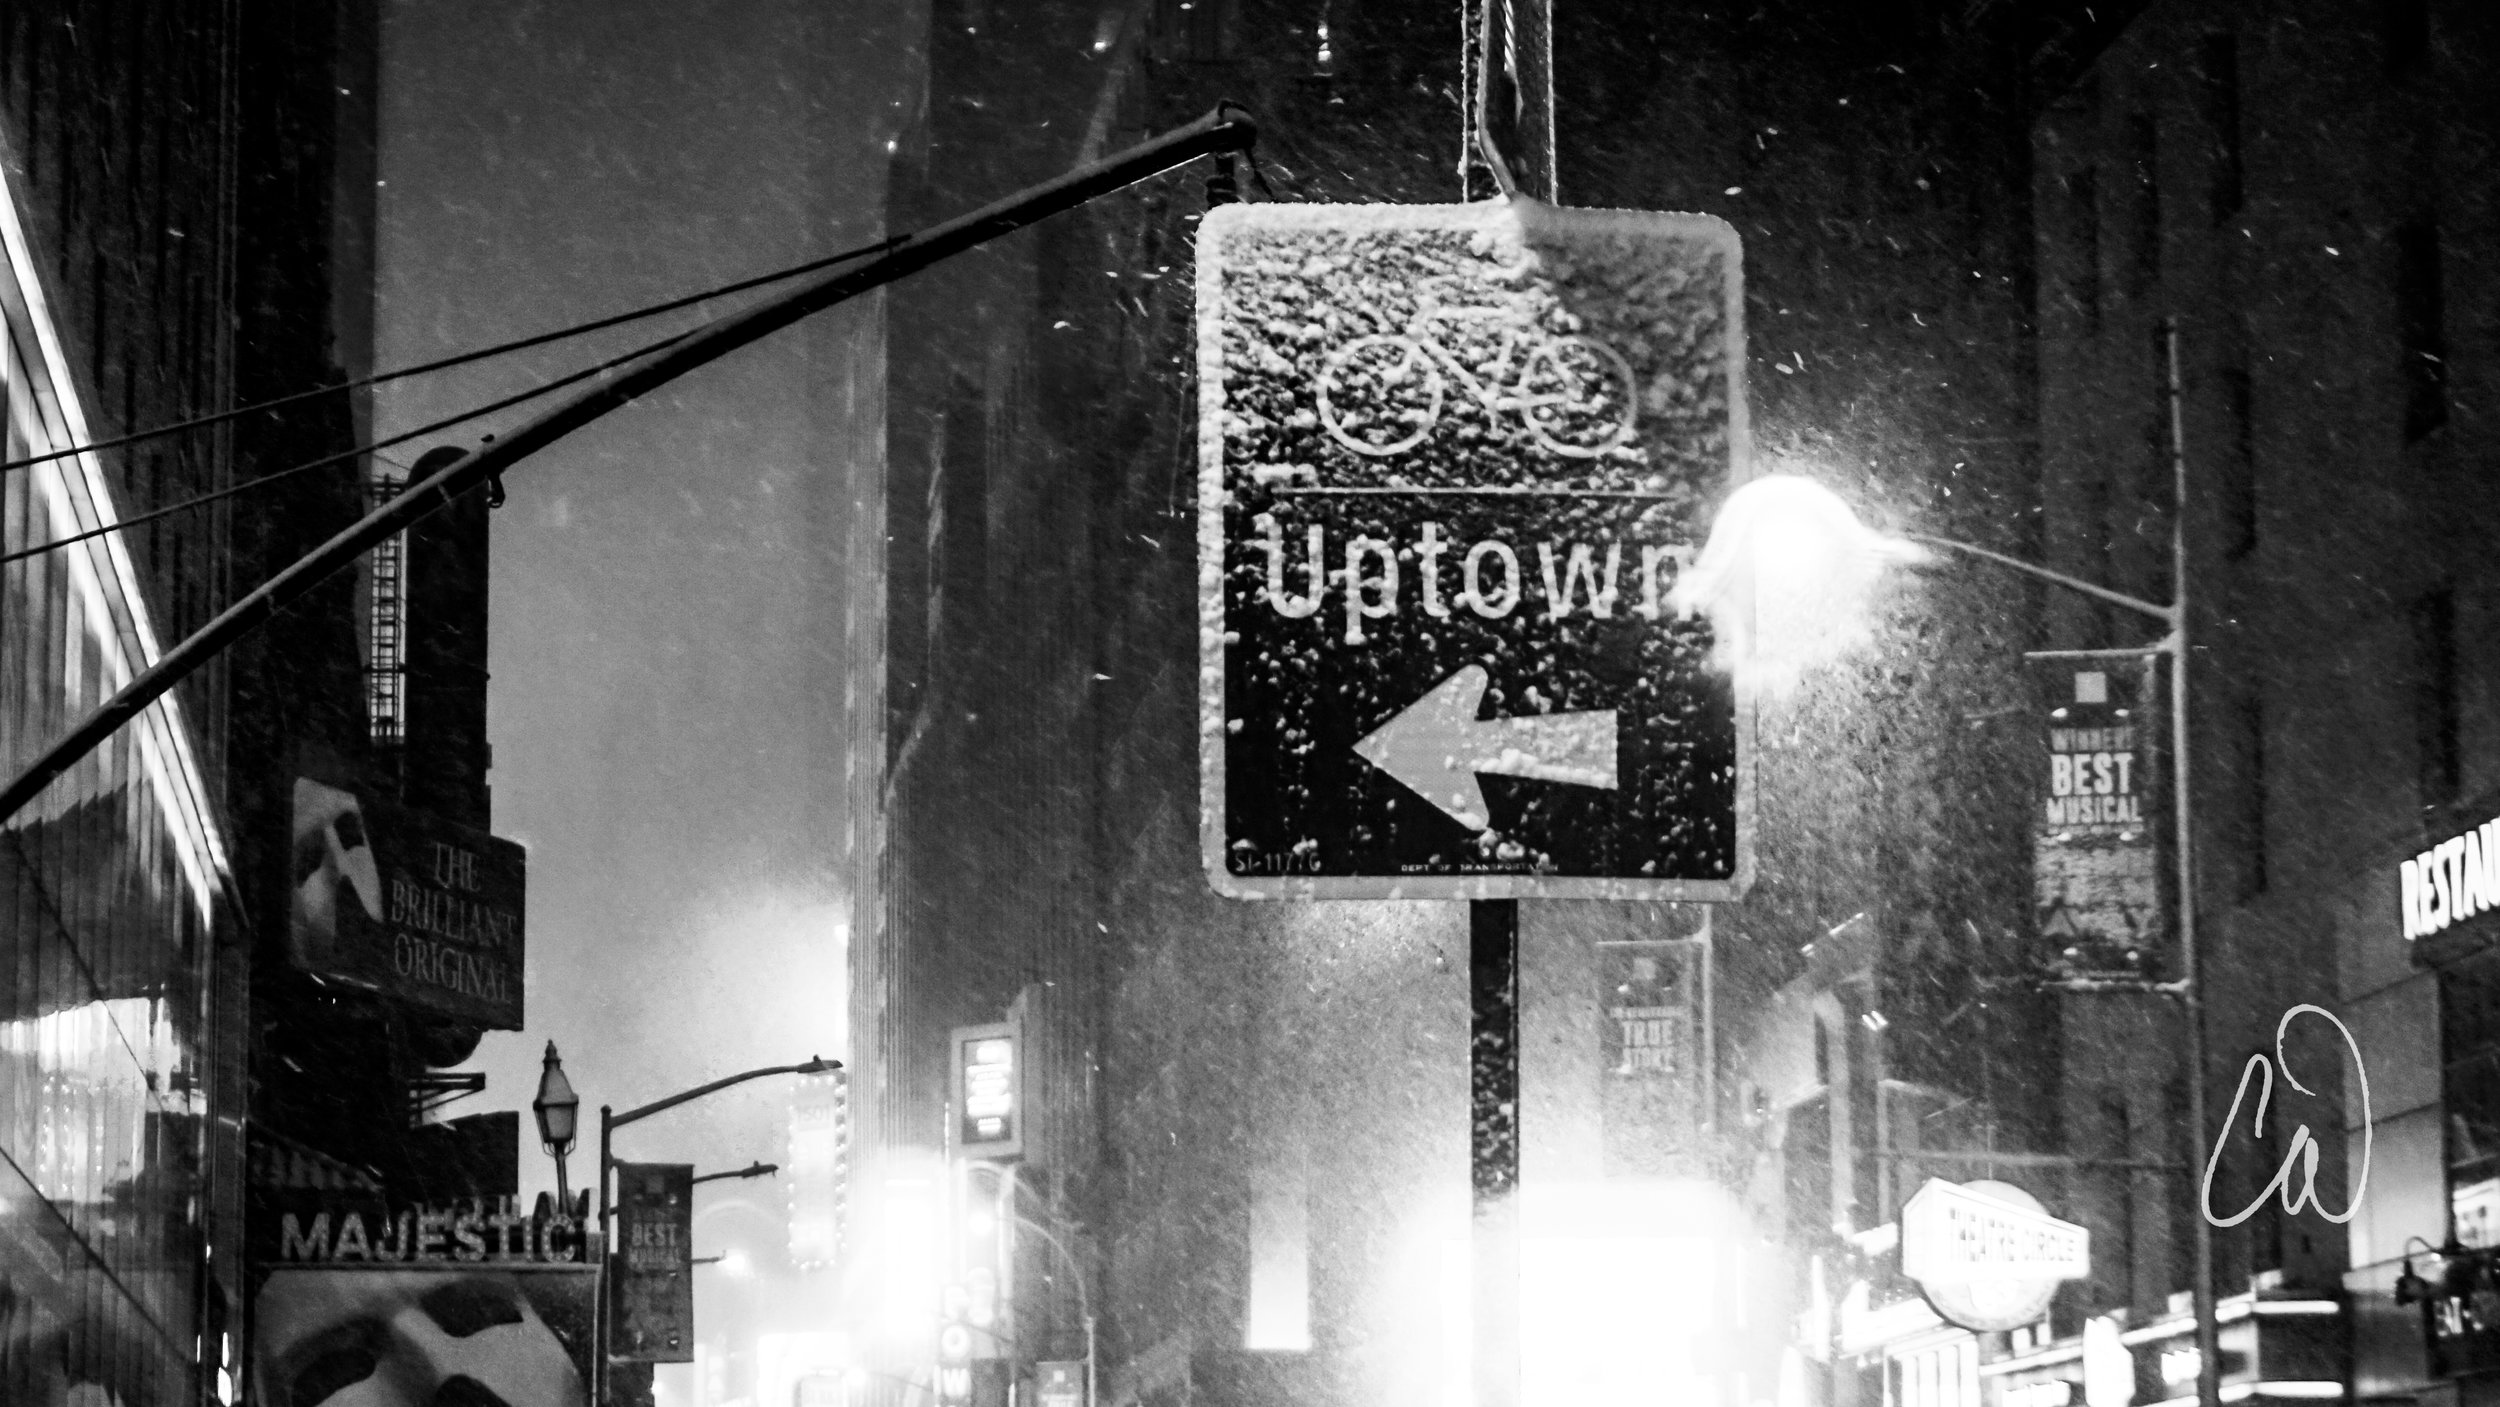 UptownSigninSNowLogo.jpg